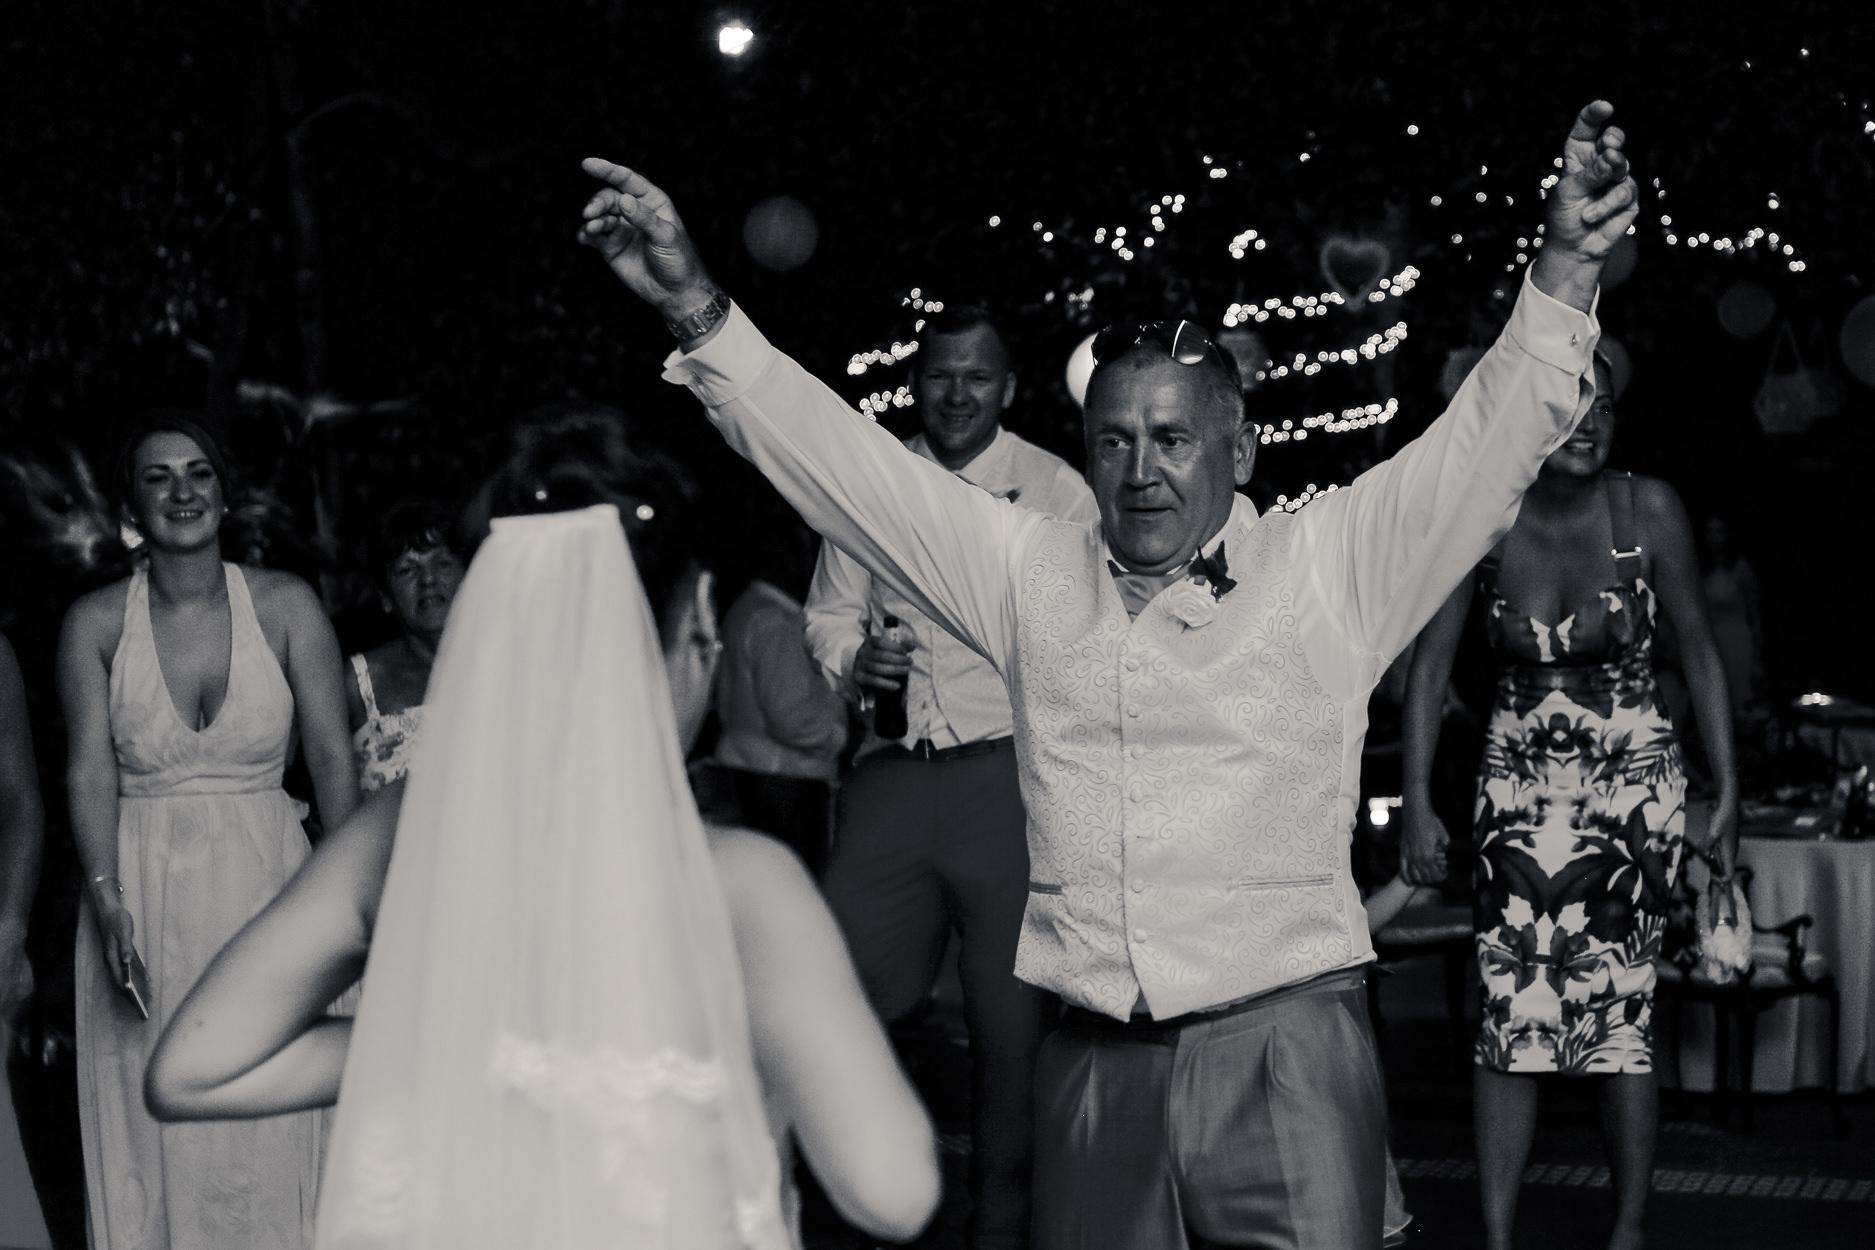 Amalfi-Coast-wedding-venue-Wedding-Photography-Villa Antiche Mura-Sorrento-Italy-38